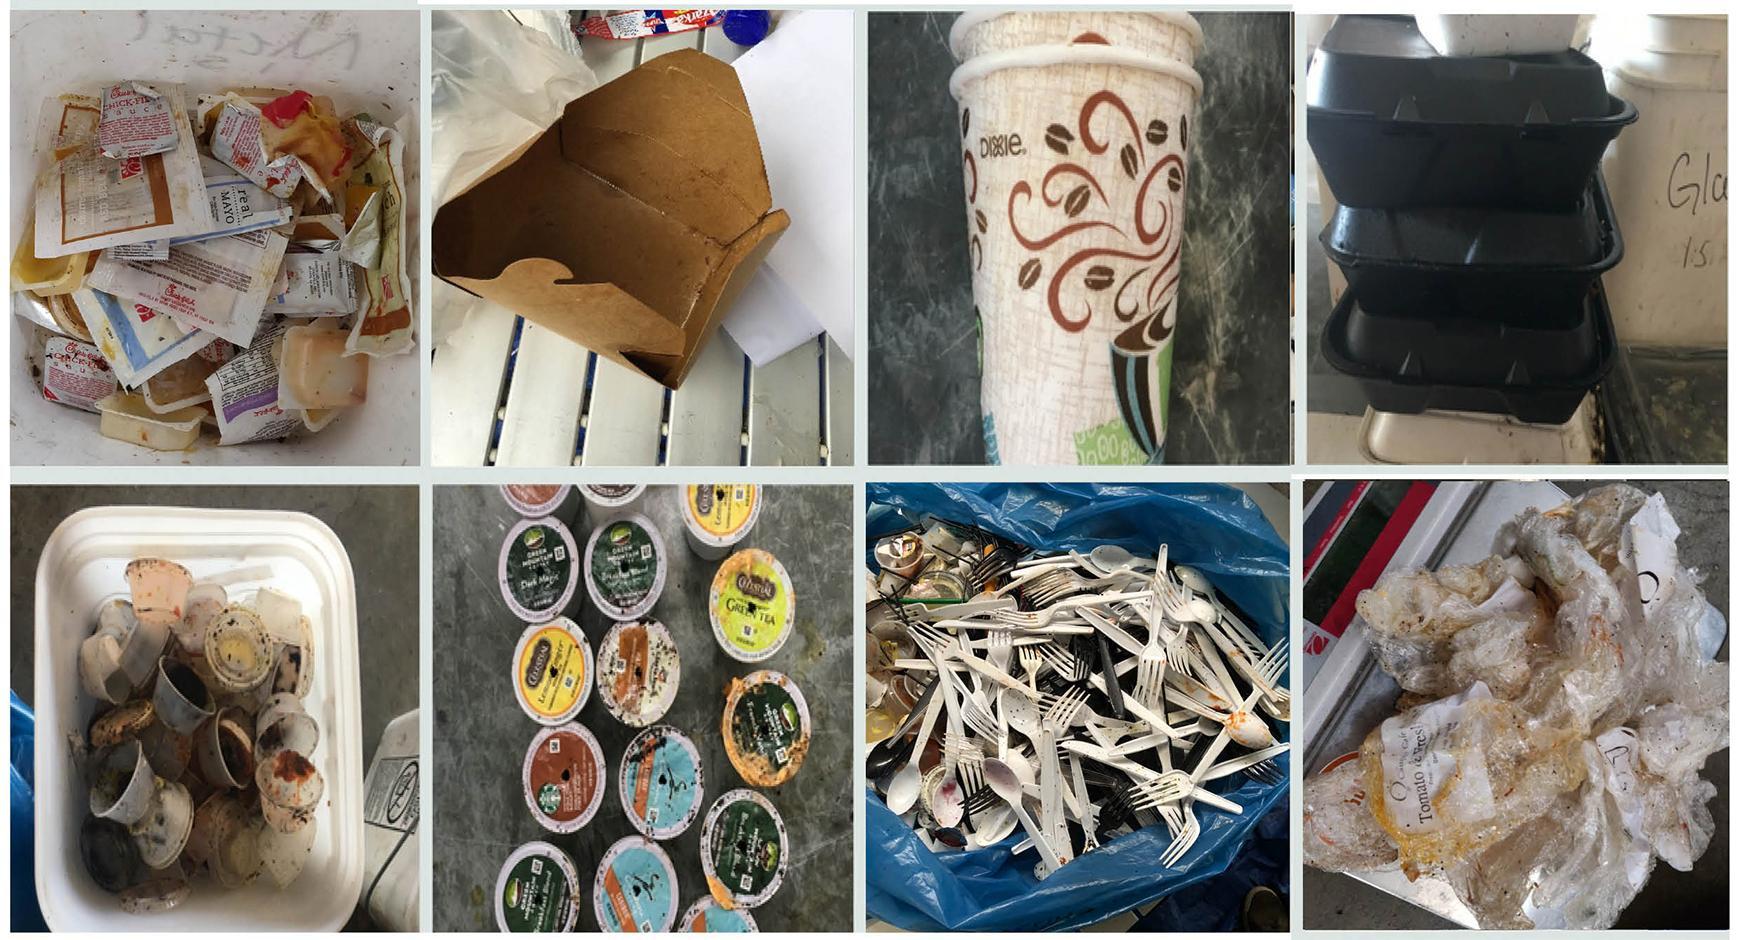 Food packaging found in waste audit at UT